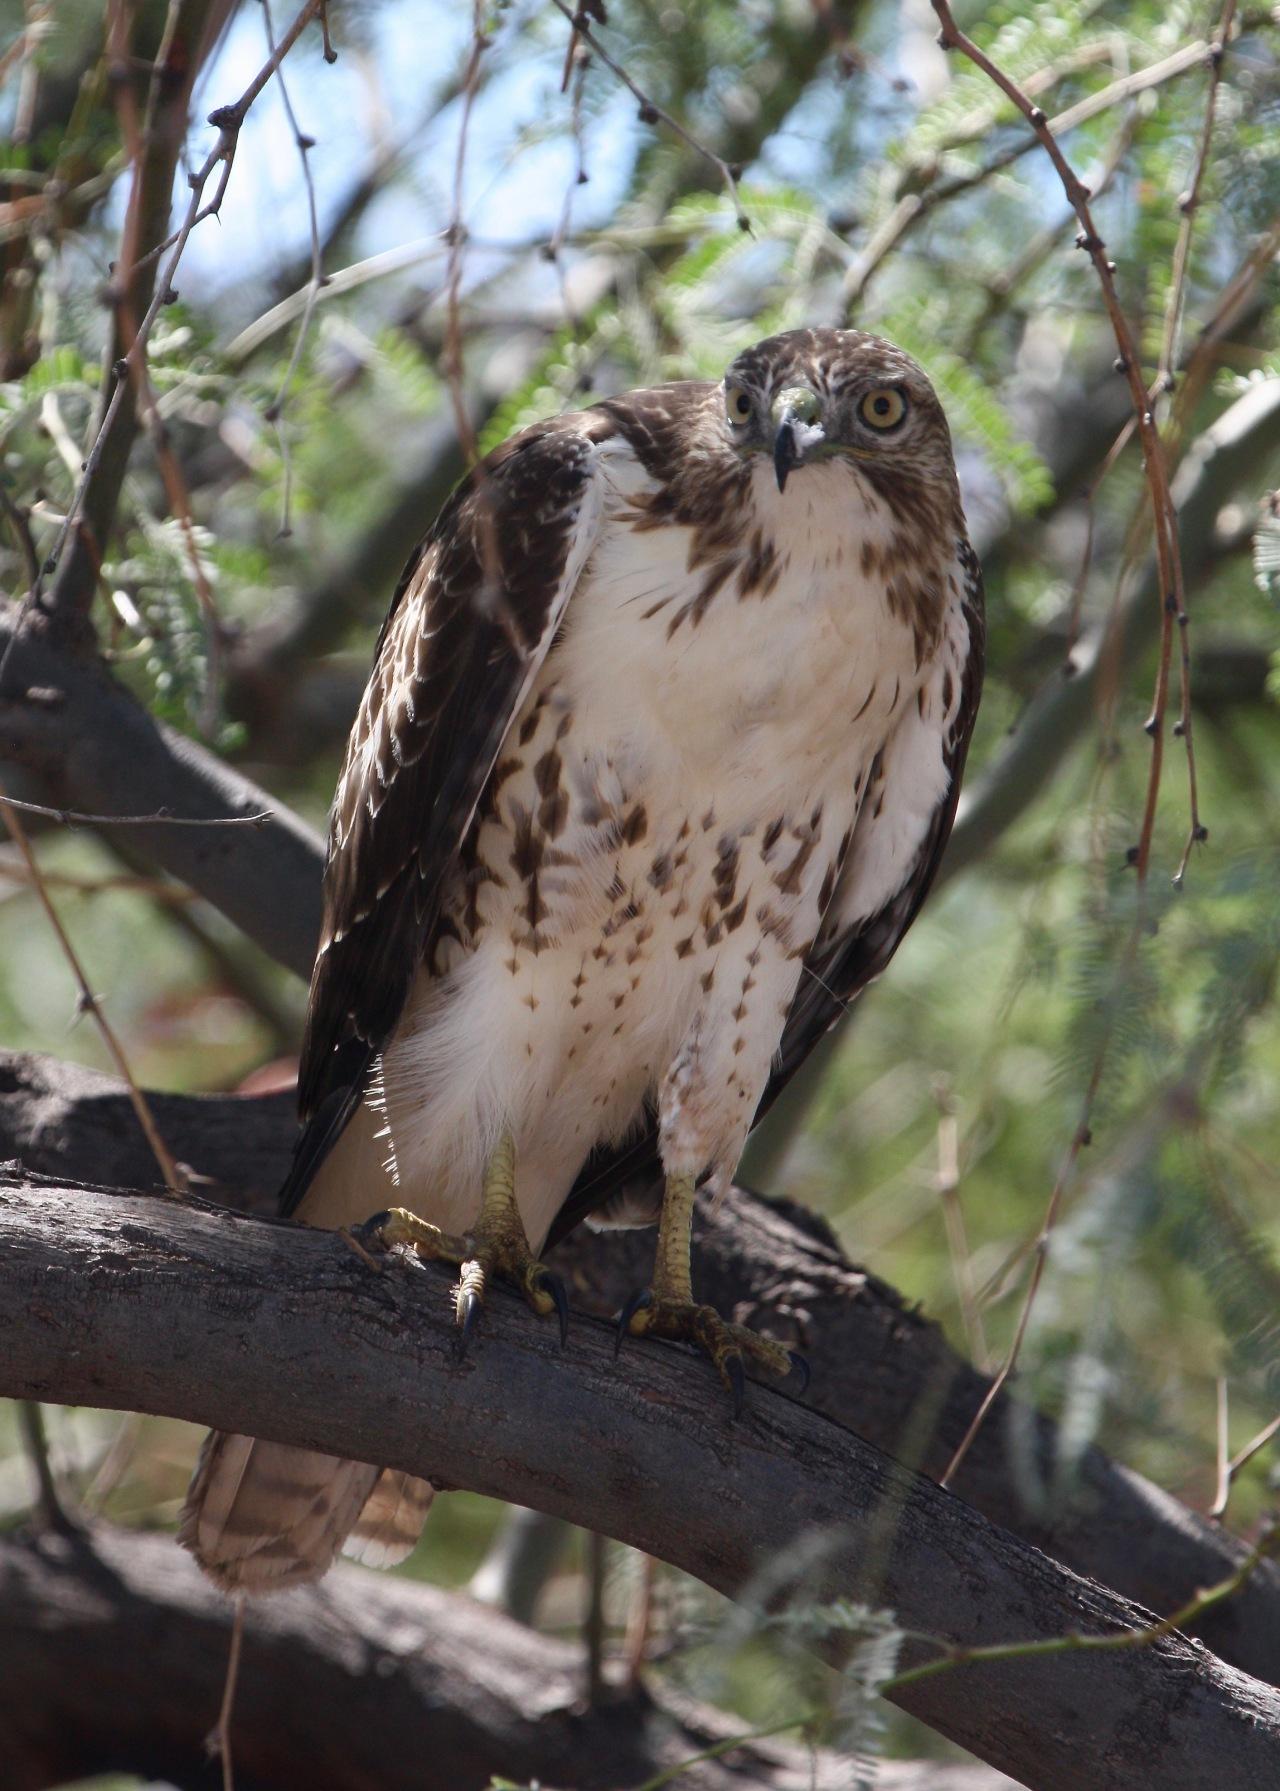 Red-tailed Hawk - Juvenile Buteo jamaicensis